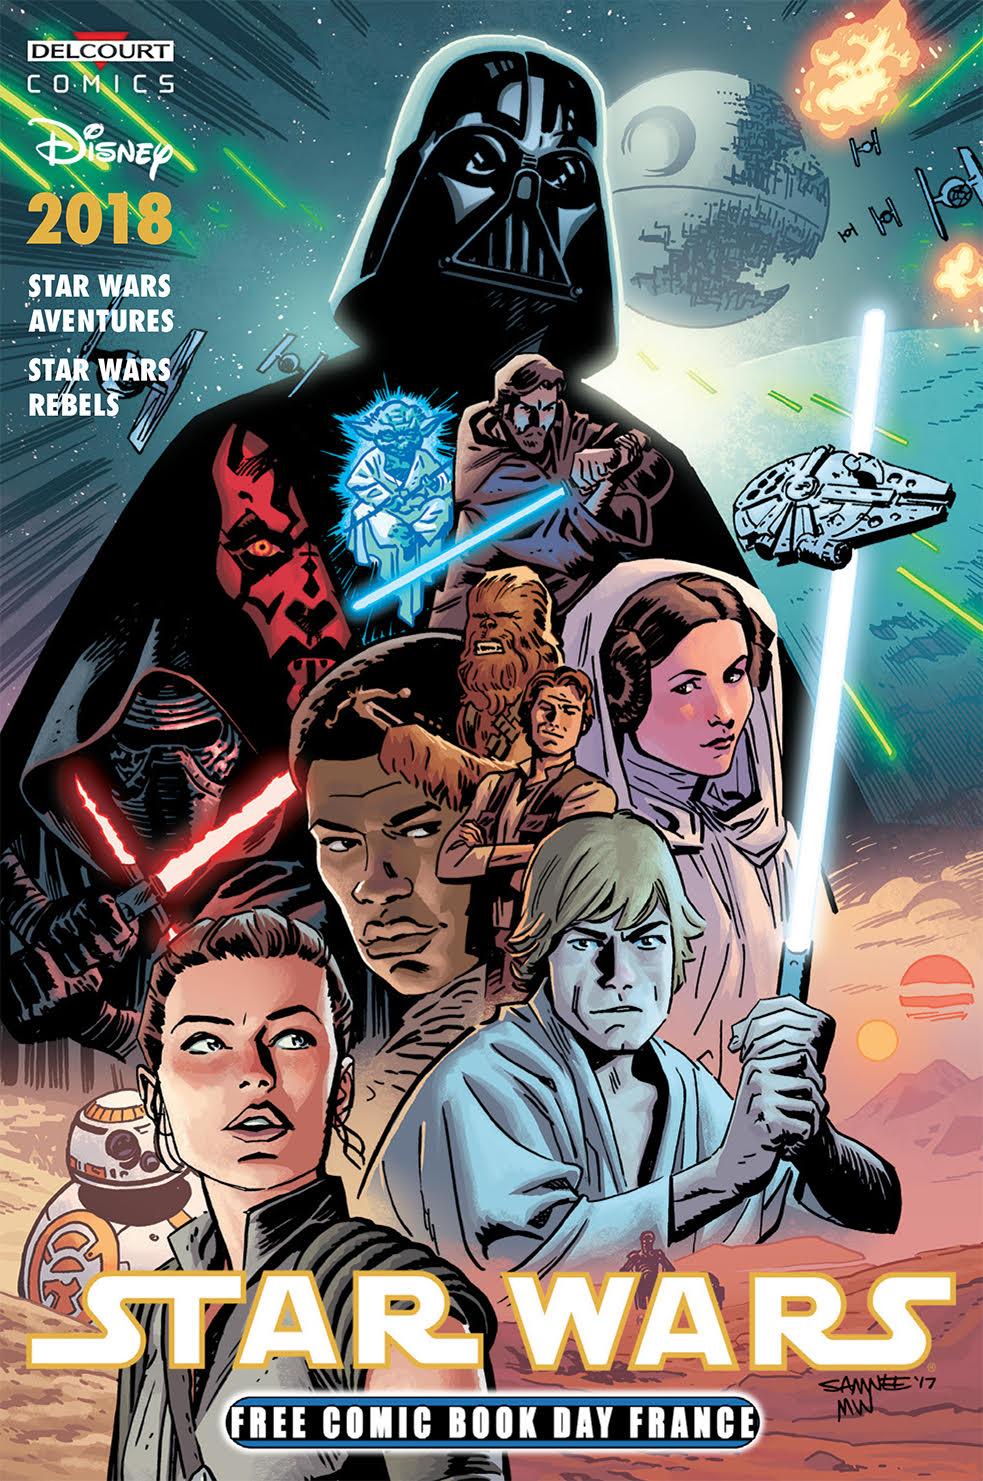 FCBD2018 - Star Wars